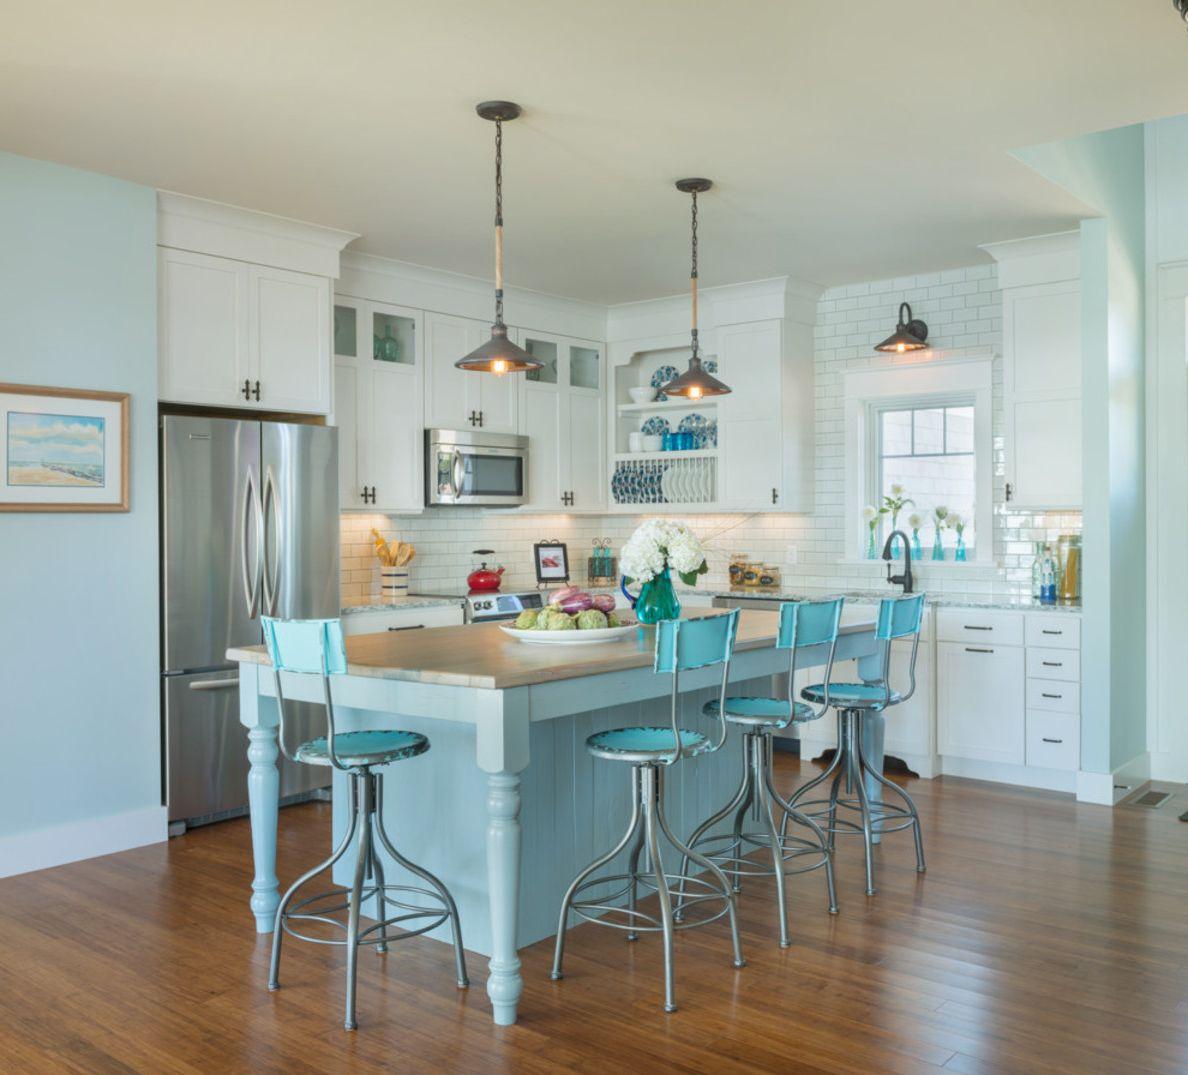 beachy-kitchen-decor-trend-with-additional-minimalist-design-imageseach-themed-decorating-kitchen decor theme ideas